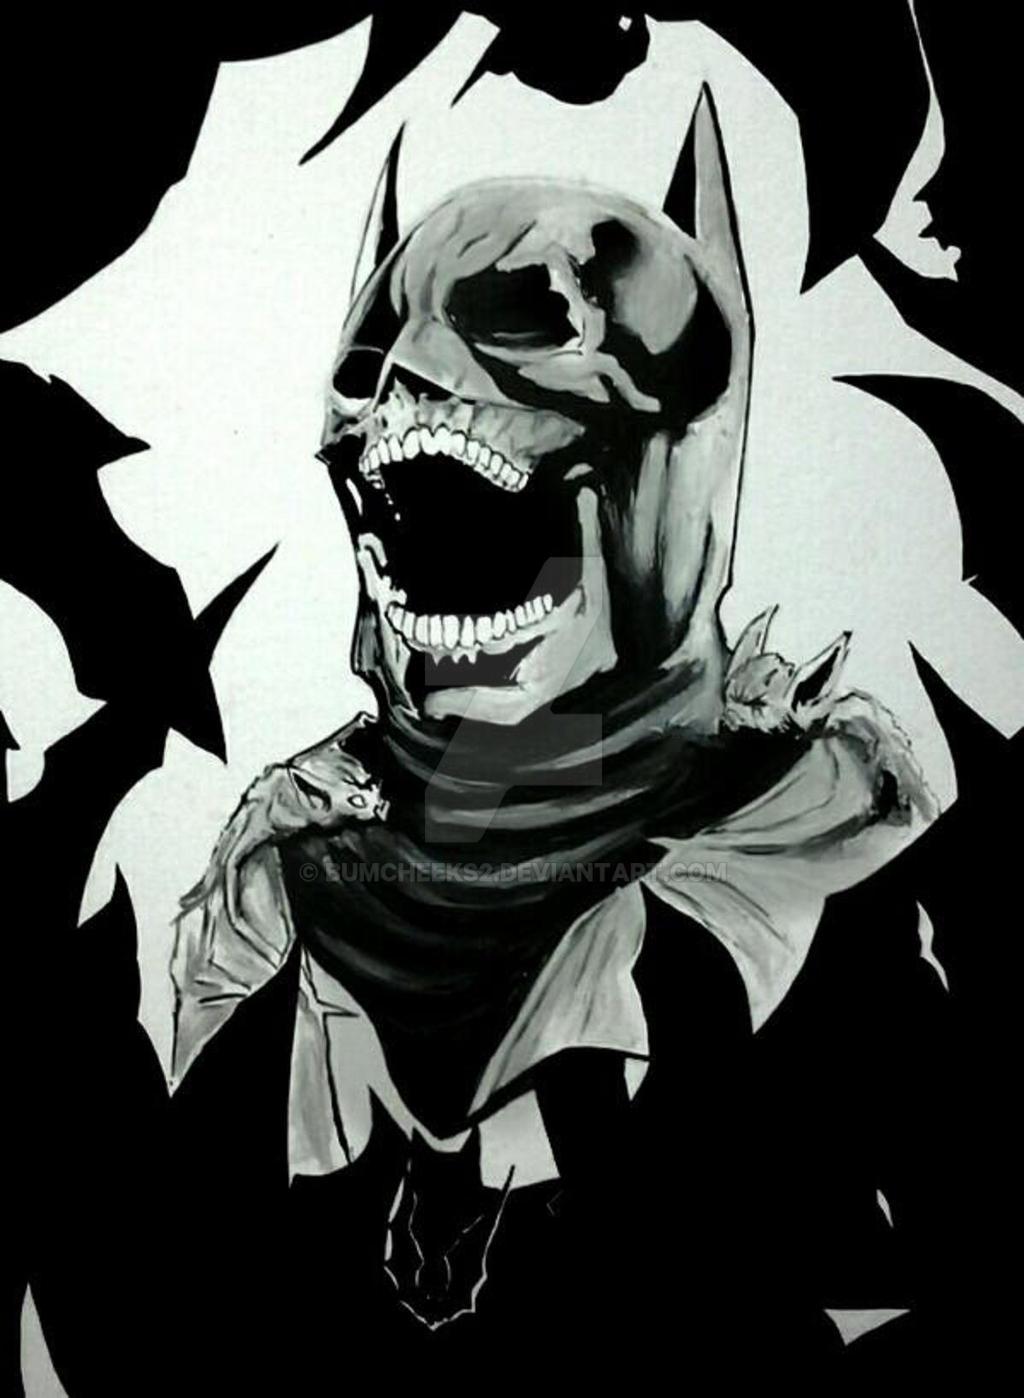 BATMAN by BUMCHEEKS2